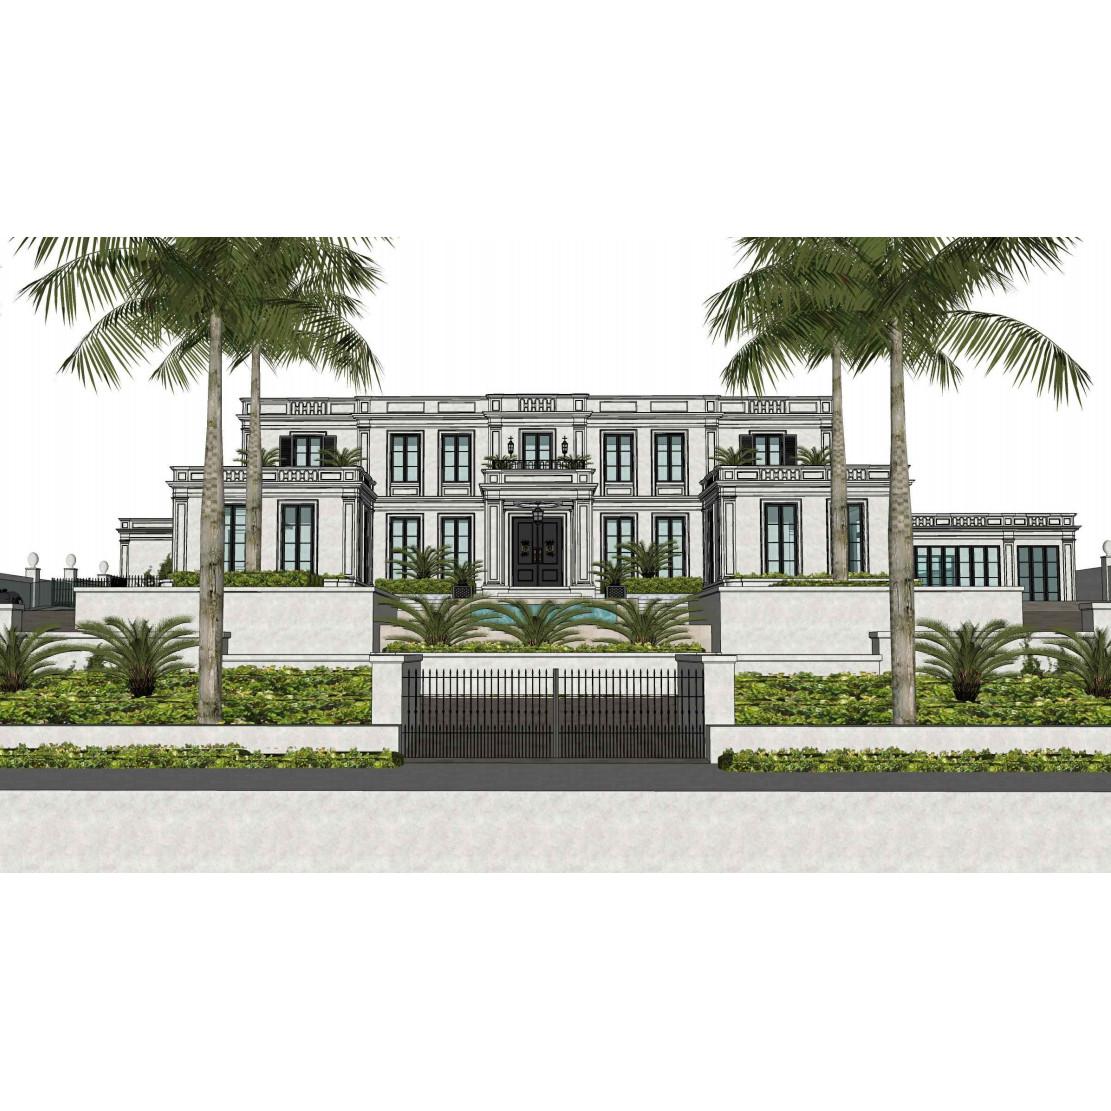 Bahamas beach house sketch